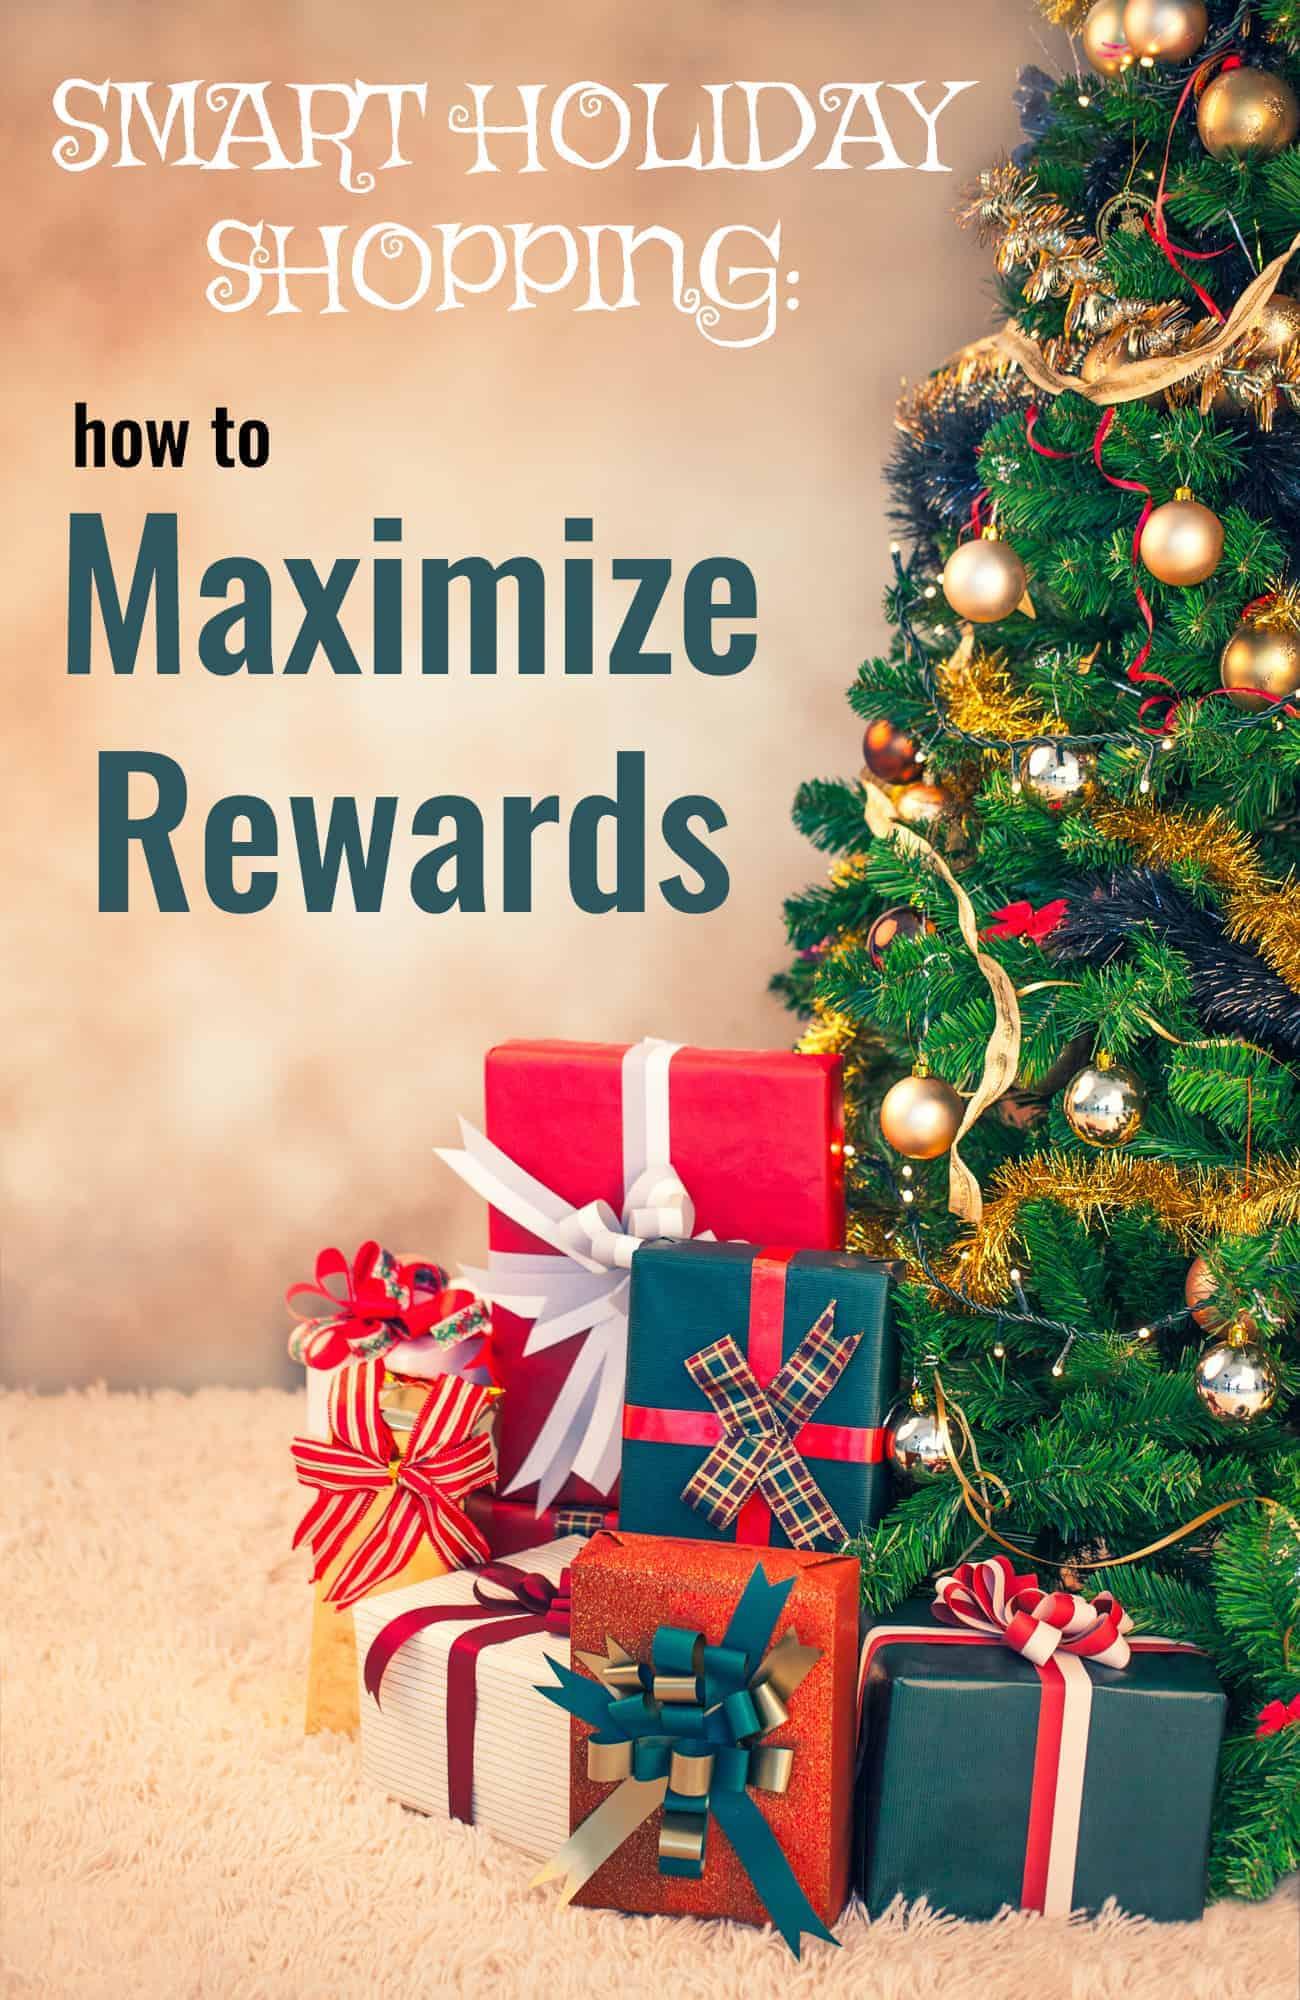 Smart Holiday Shopping Maximimize Rewards rbc credit card